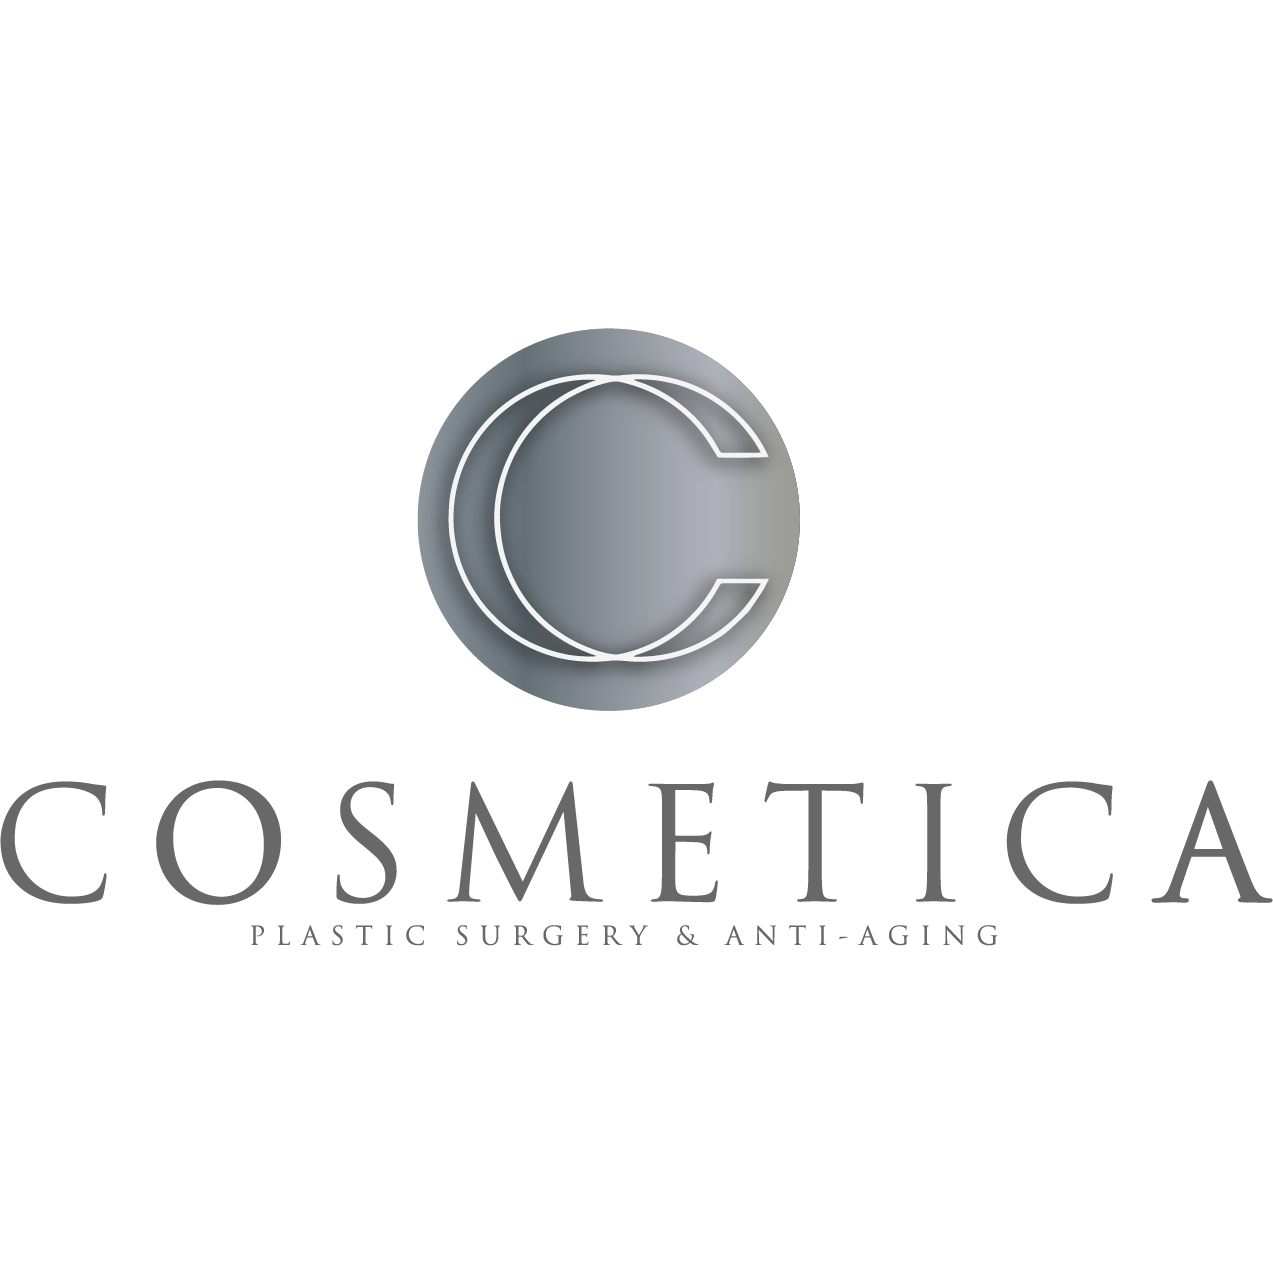 Cosmetica Plastic Surgery & Anti-Aging